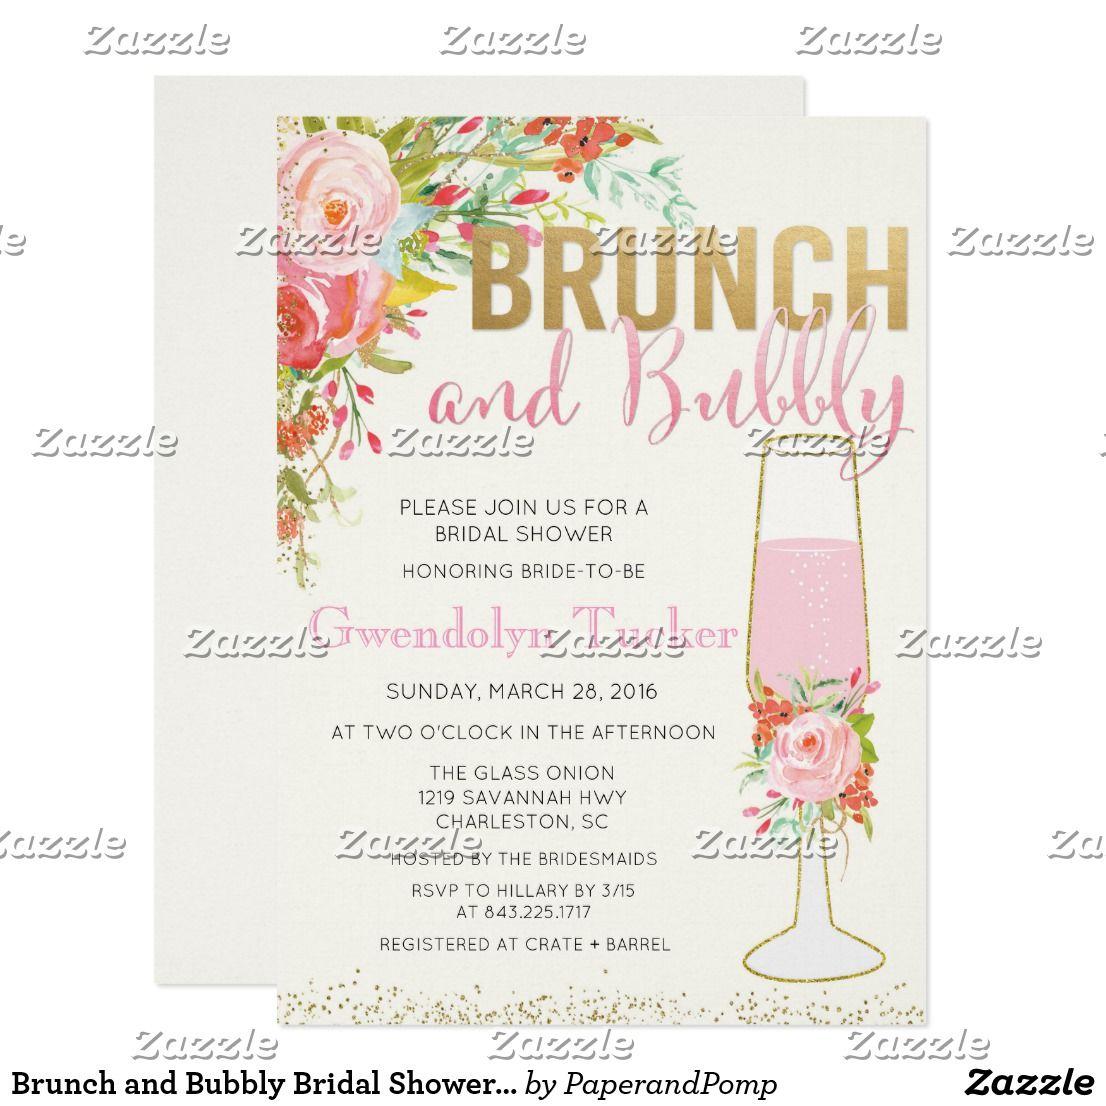 Brunch and Bubbly Bridal Shower Invitation | Bridal showers, Shower ...